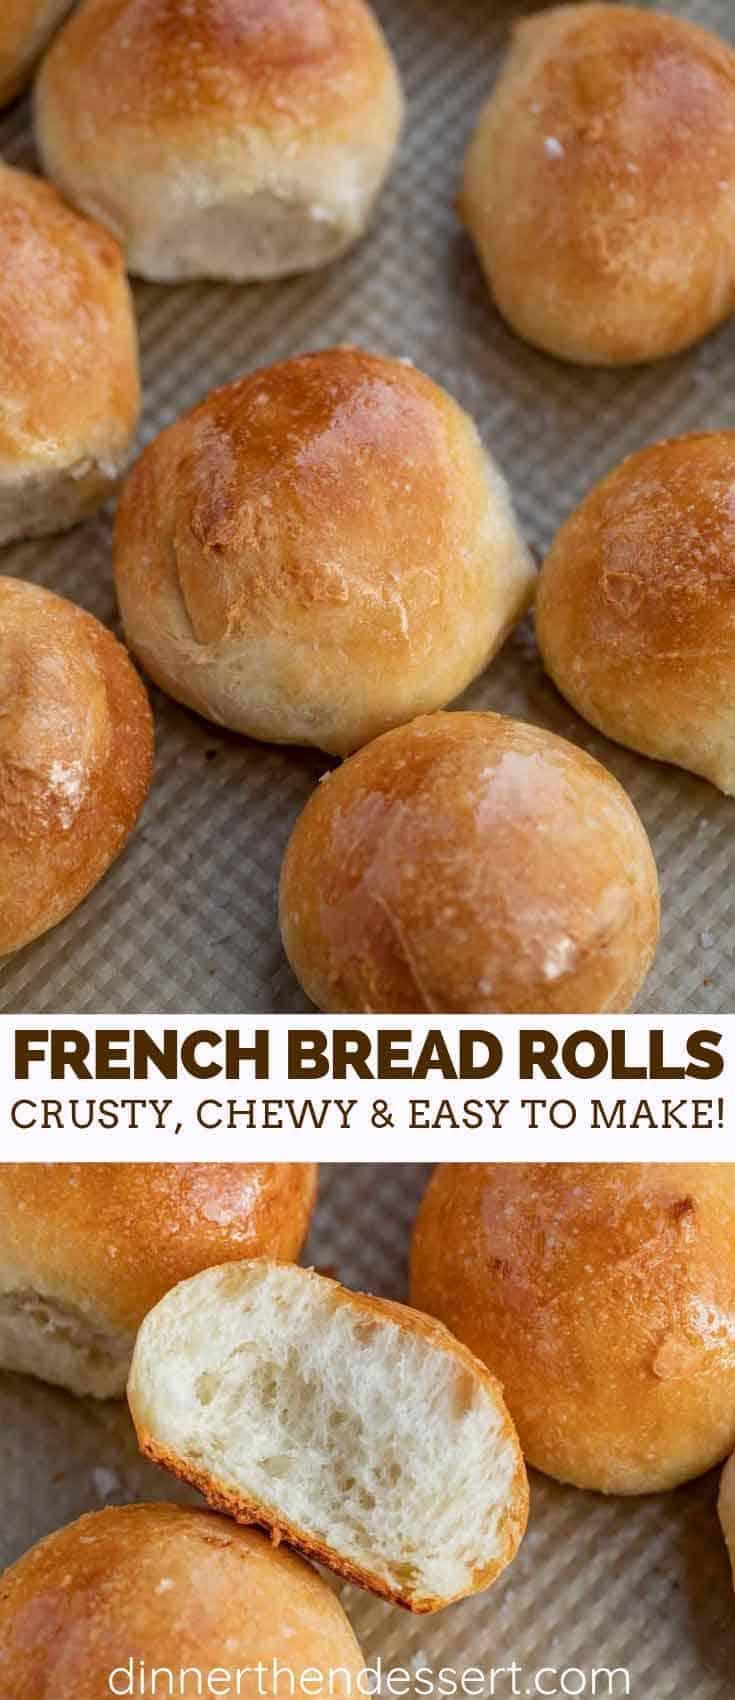 Crusty French Bread Rolls Dinner Then Dessert